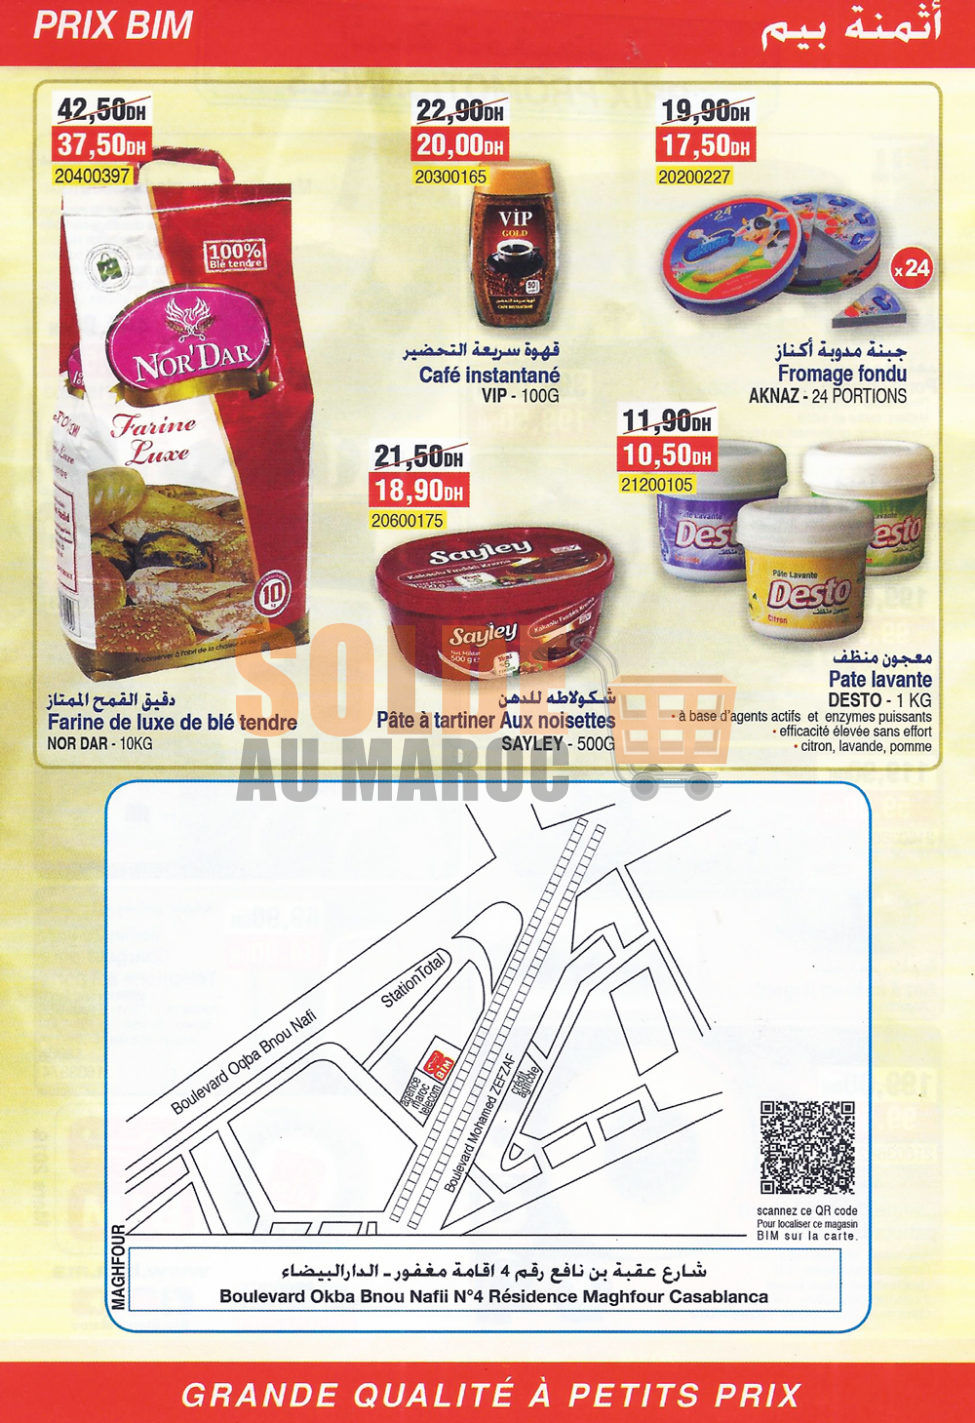 Catalogue Bim Lot Maghfour Attacharok Casablanca du 15 au 17 Mars 2019